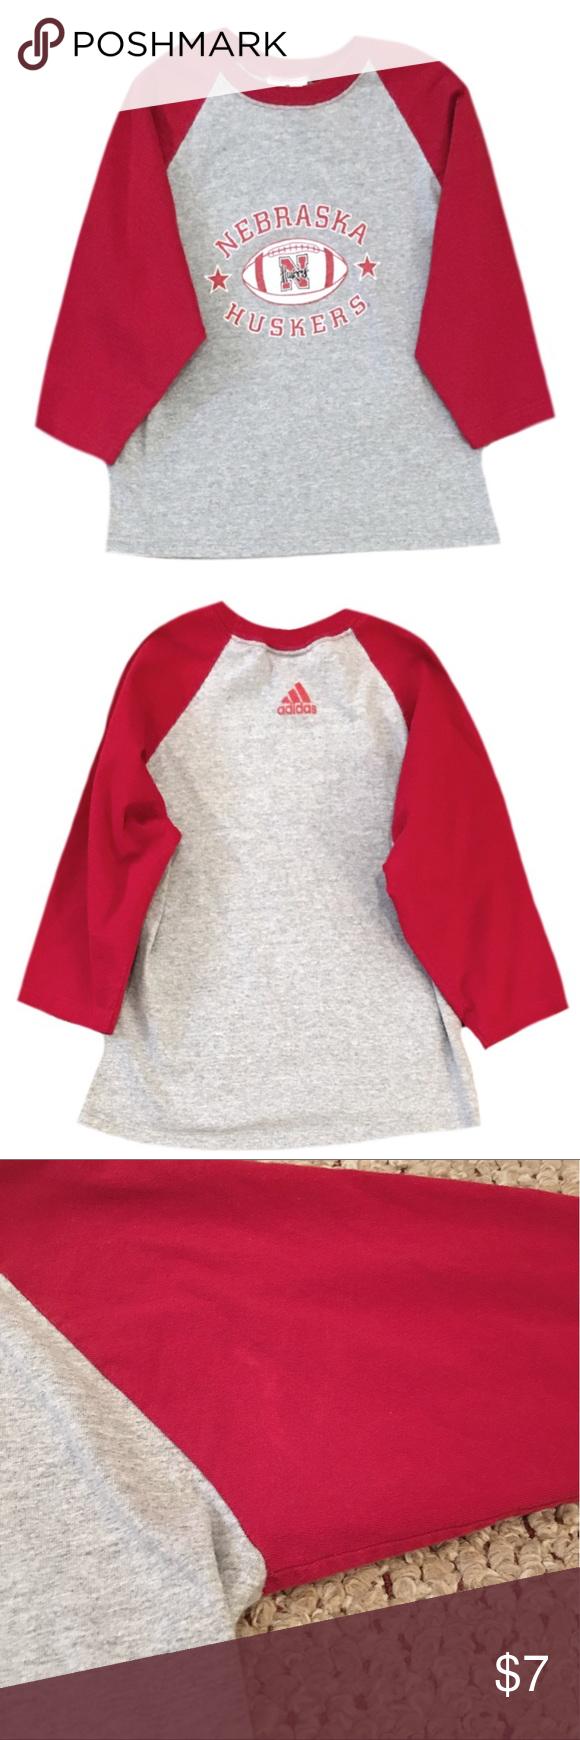 Adidas nebraska huskers sleeve top adidas cotton and gray